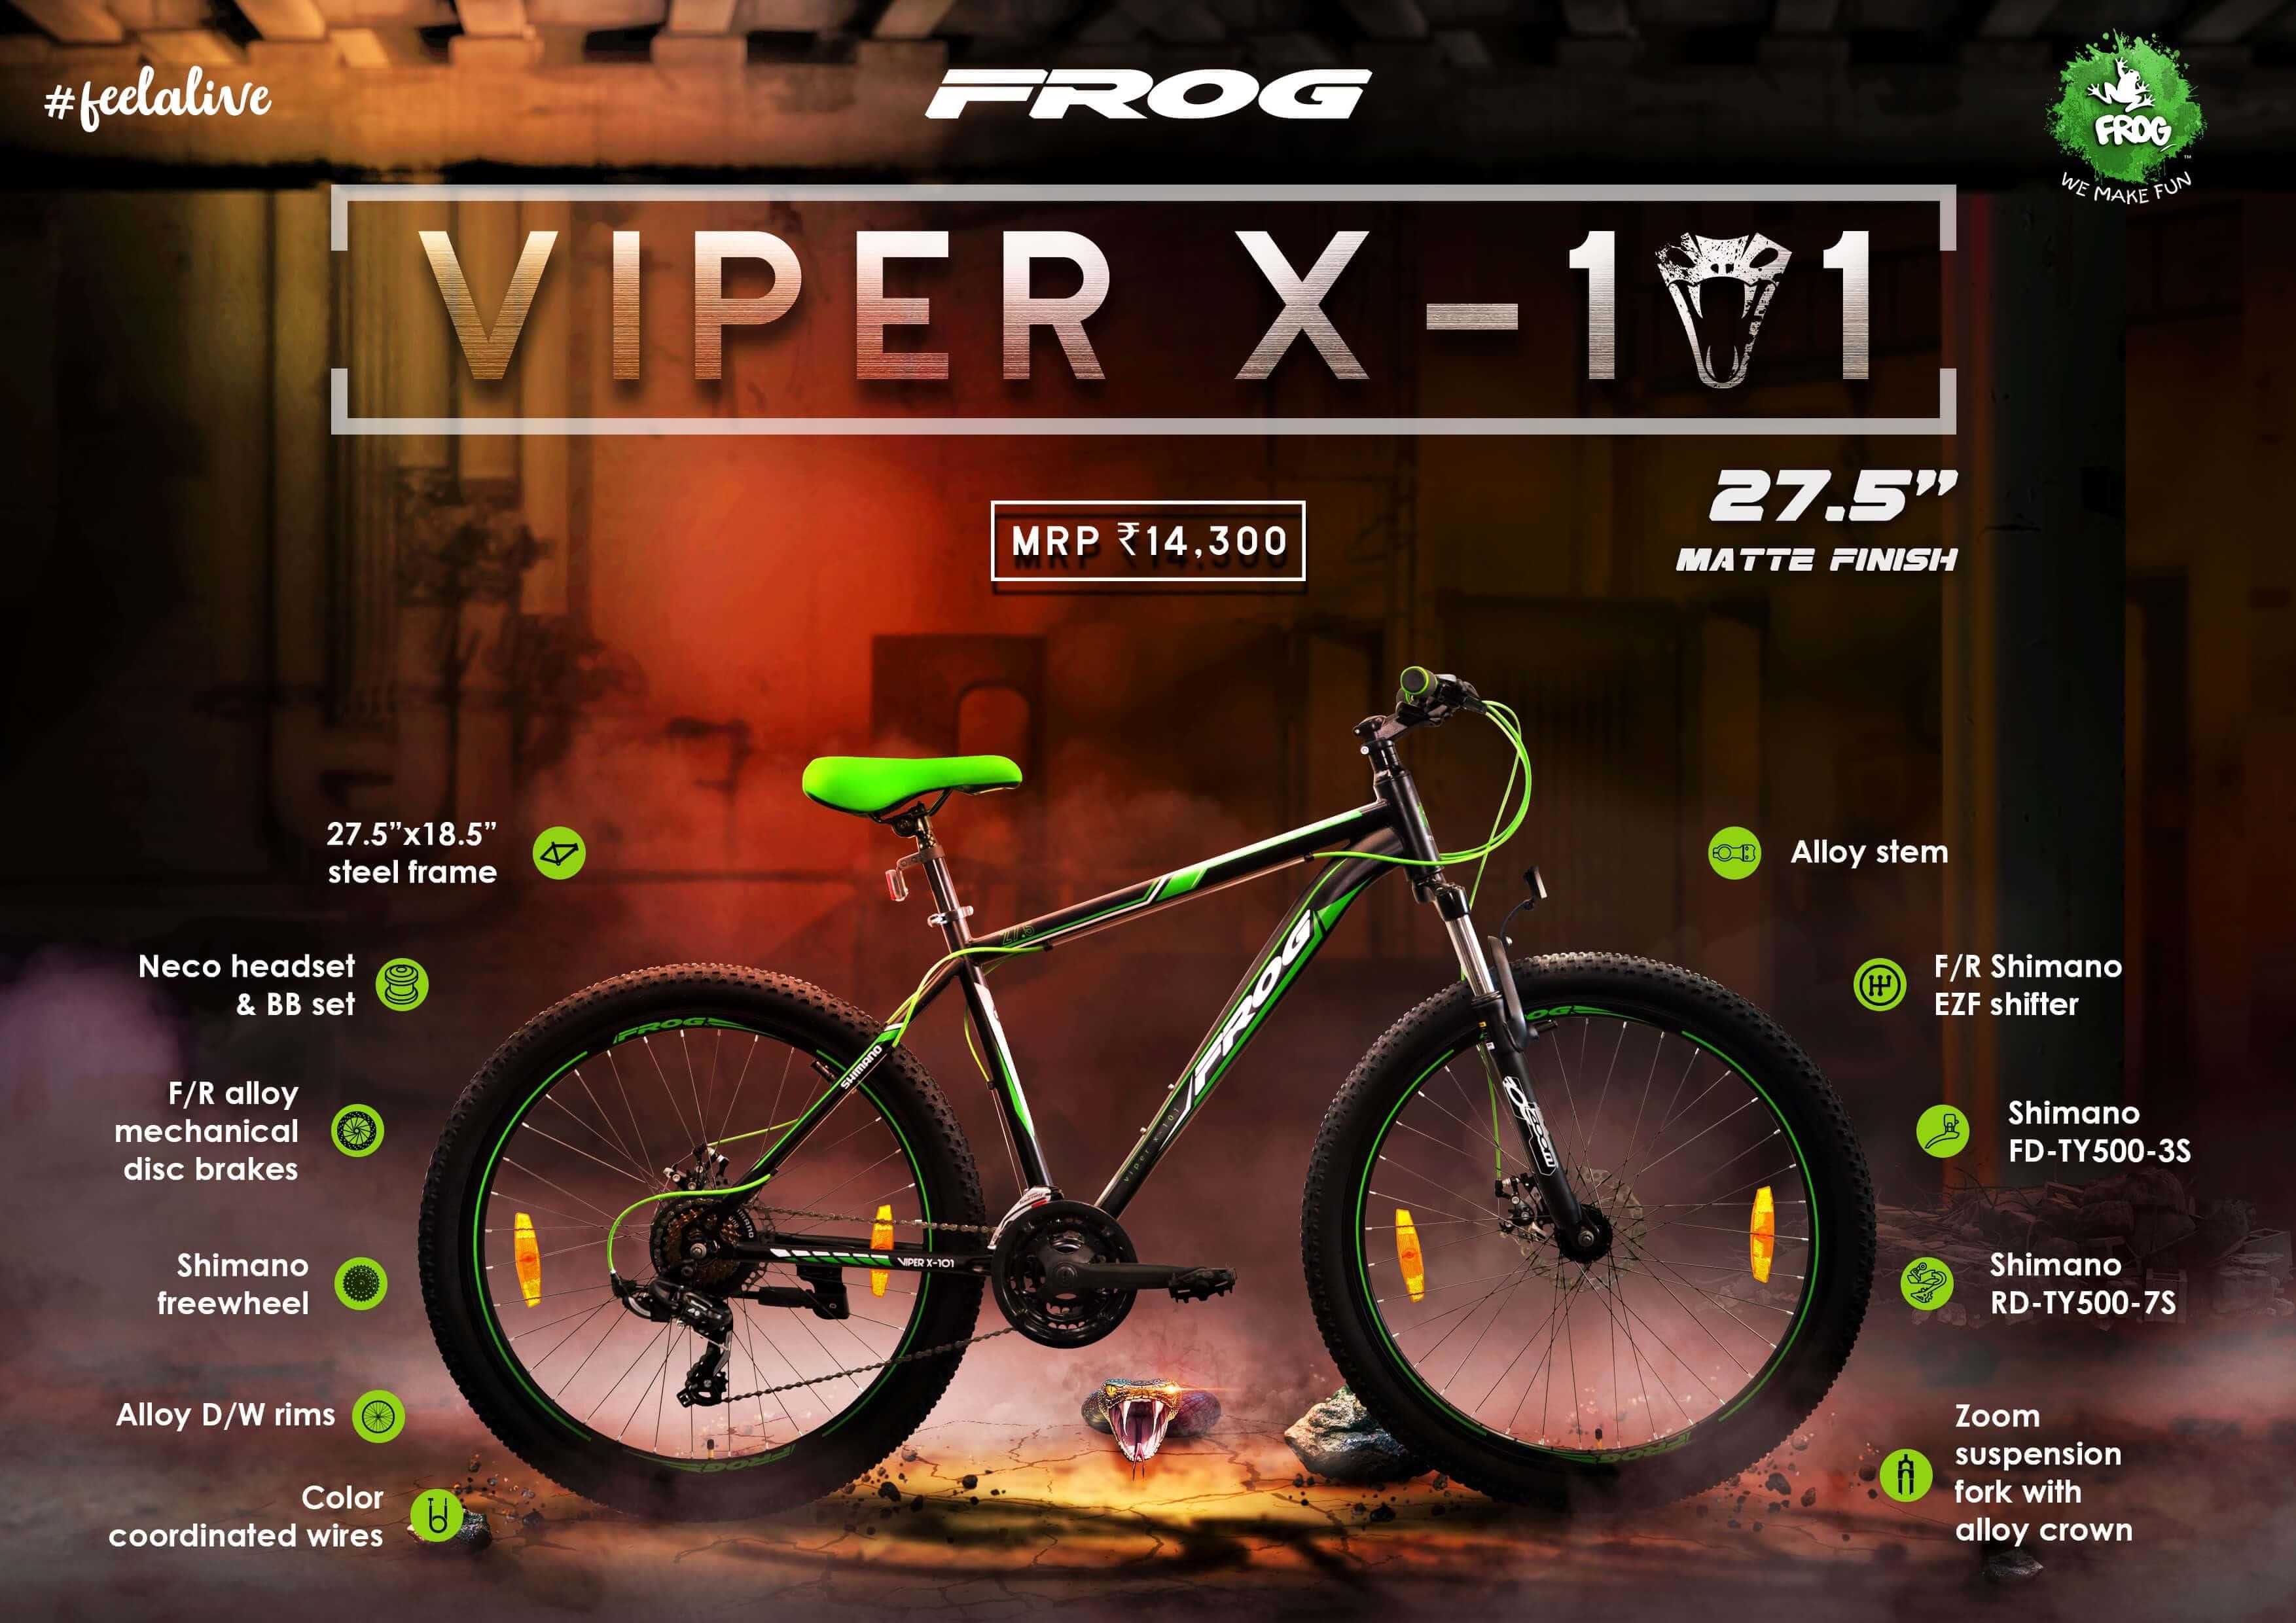 Viper X 101 27 5 Black Green image 2